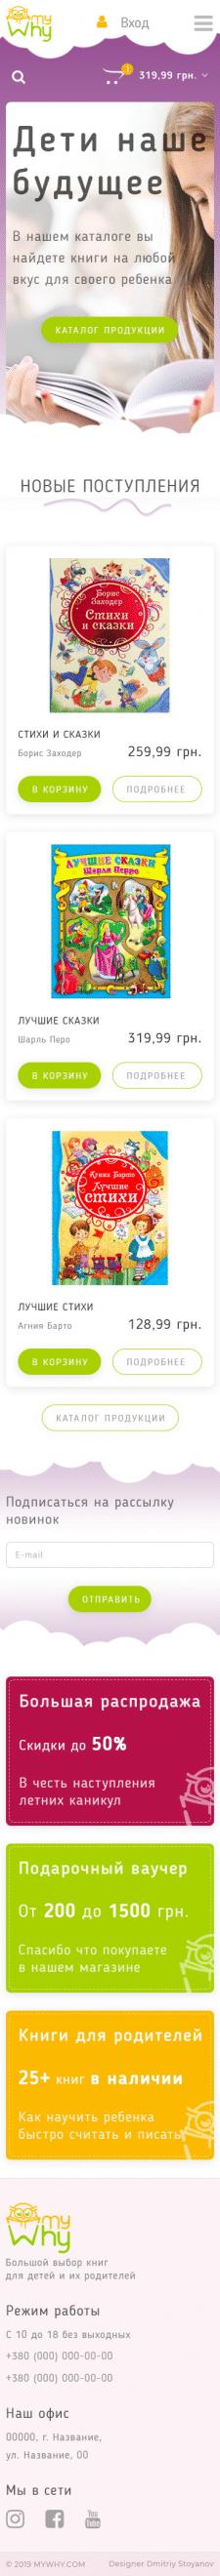 Магазин детских товарок, Child story mobile